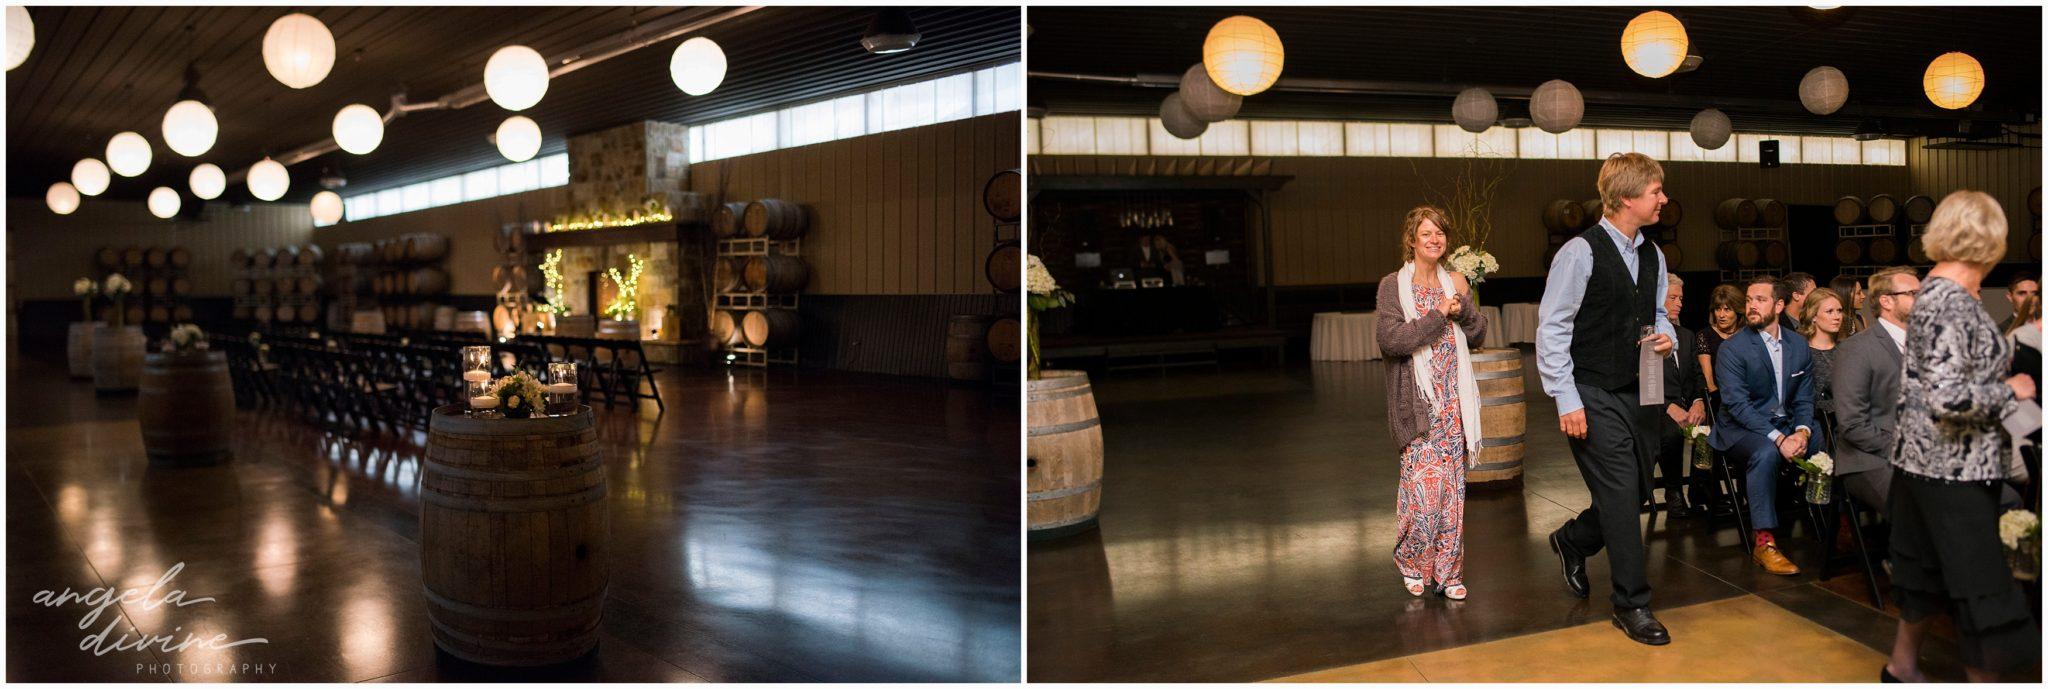 Carlos Creek Winery Wedding Ceremony Space